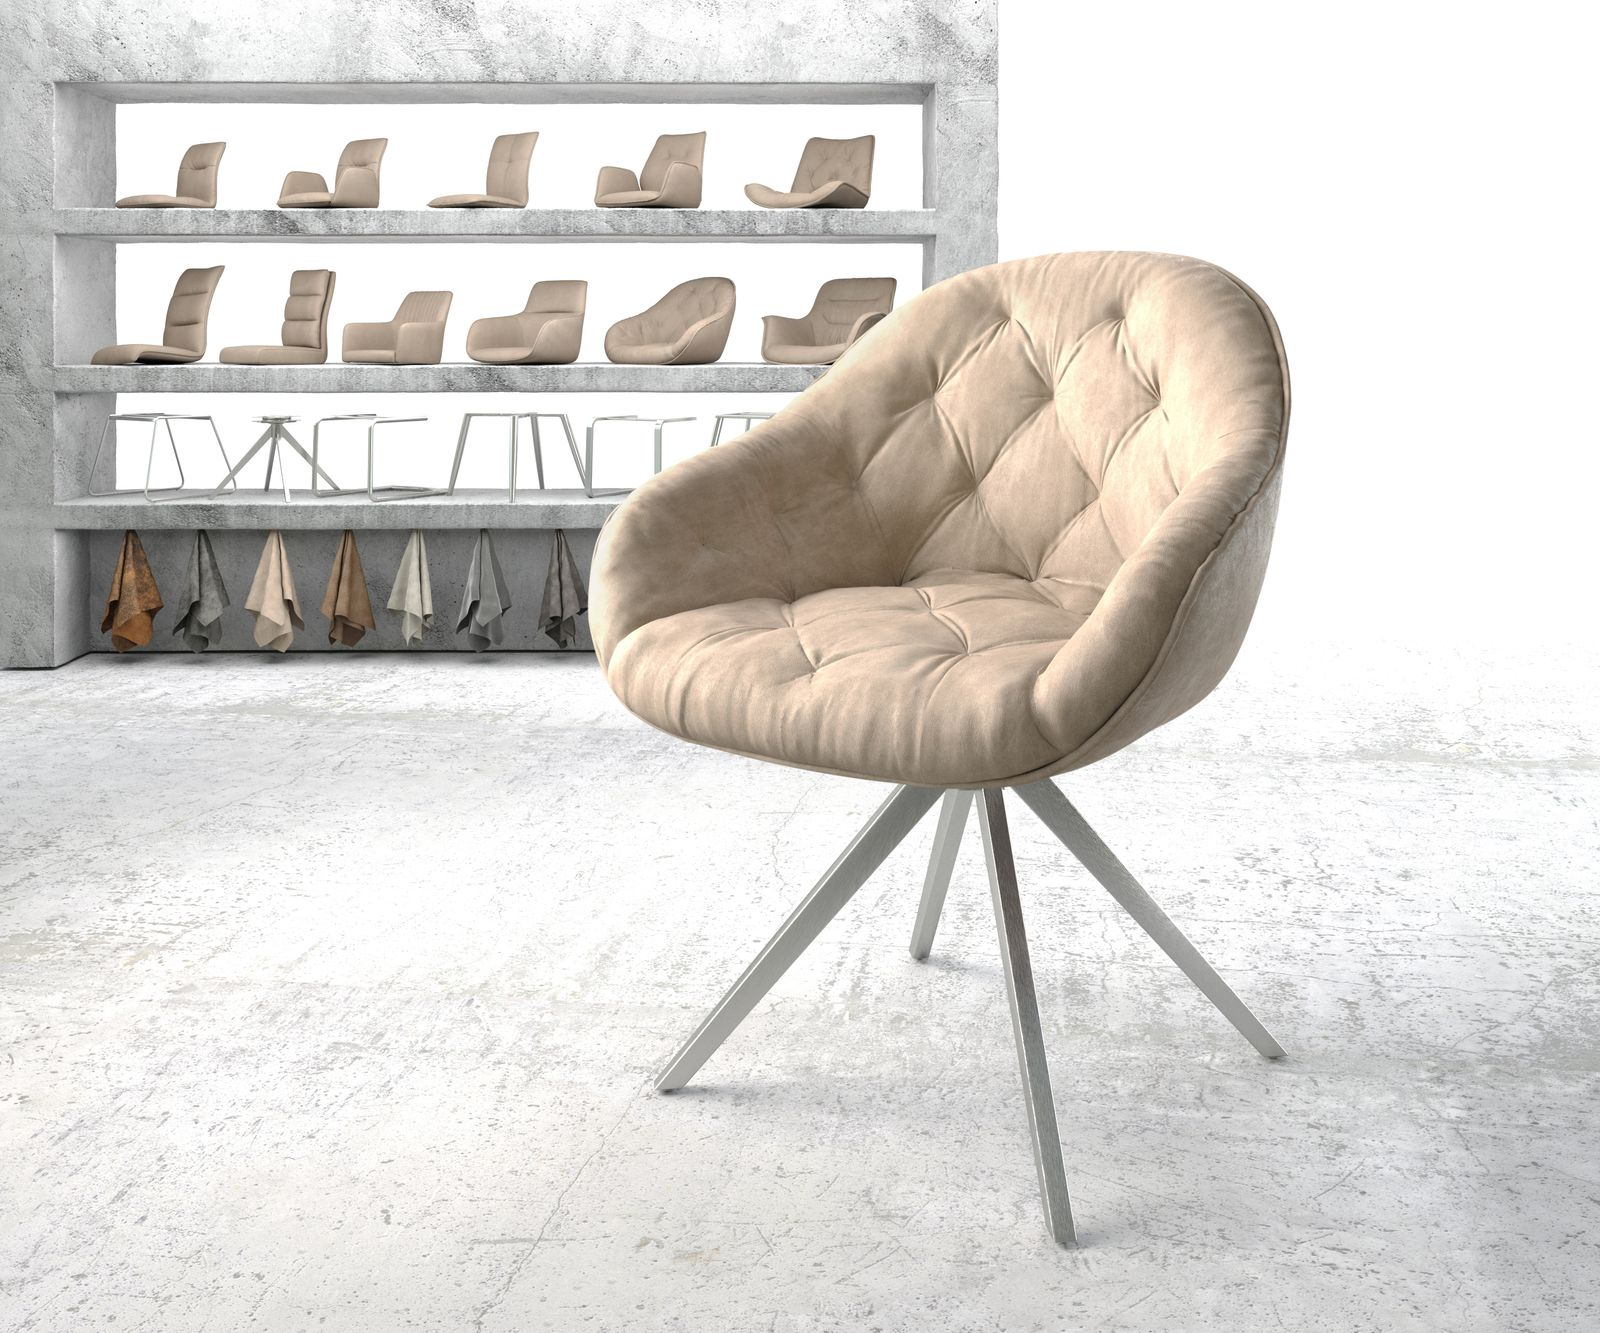 delife-armlehnstuhl-gaio-flex-beige-vintage-kreuzgestell-drehbar-edelstahl-esszimmerstuhle